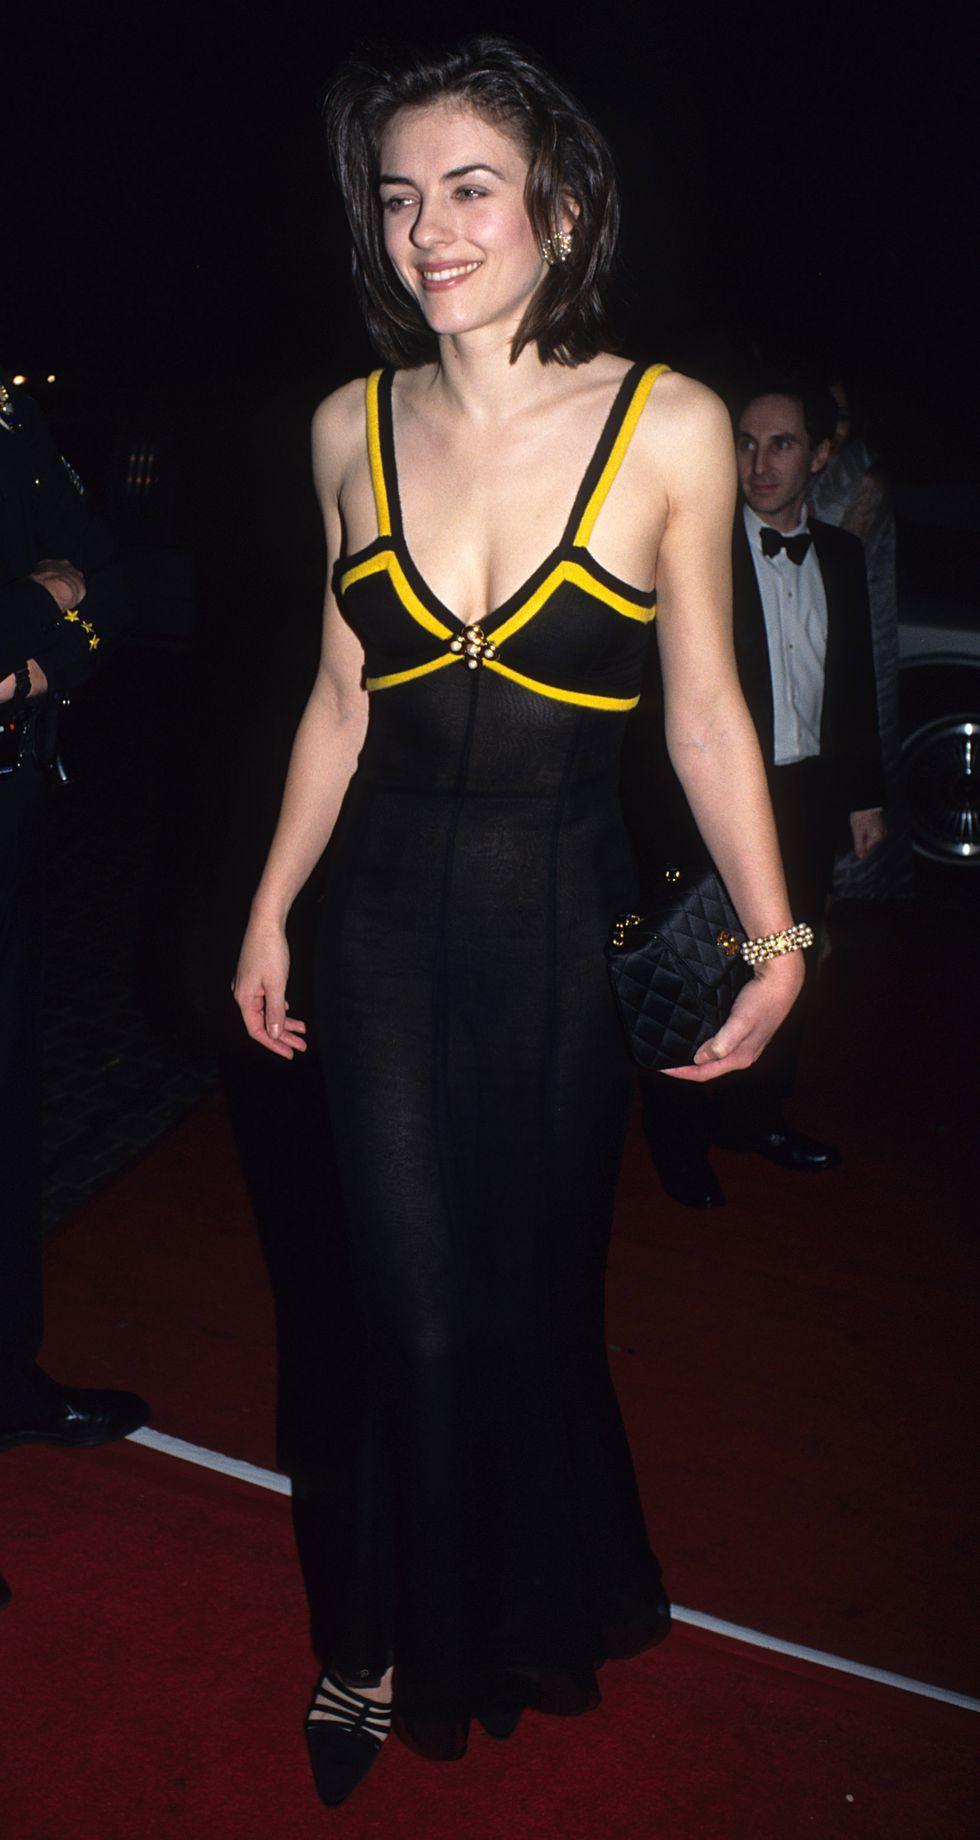 The Best Golden Globe Looks Of All Time In 2020 Elizabeth Hurley Golden Globes Dresses Celebrity Style